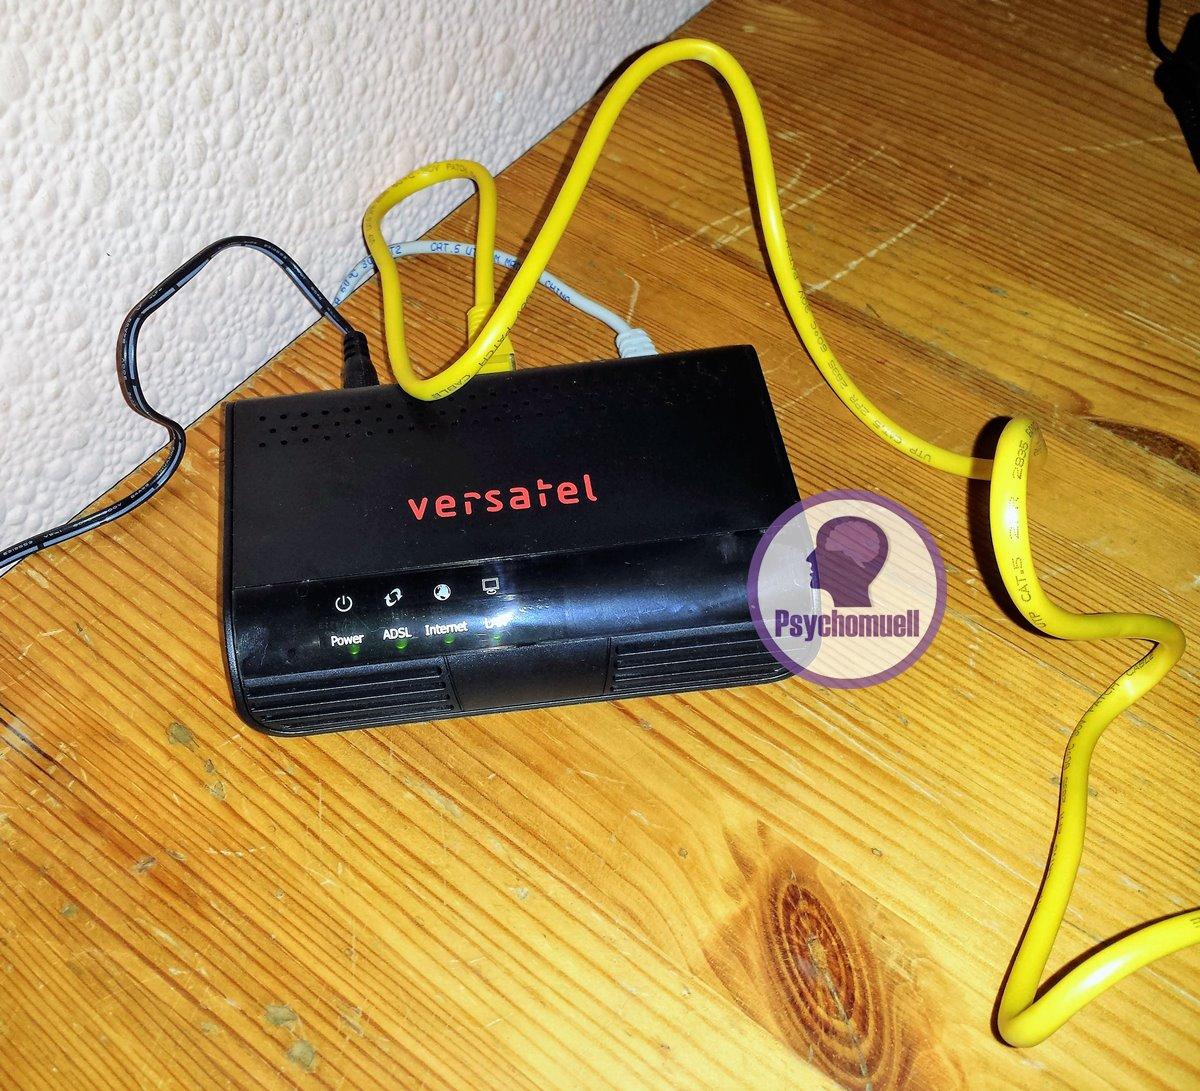 dsl-modem